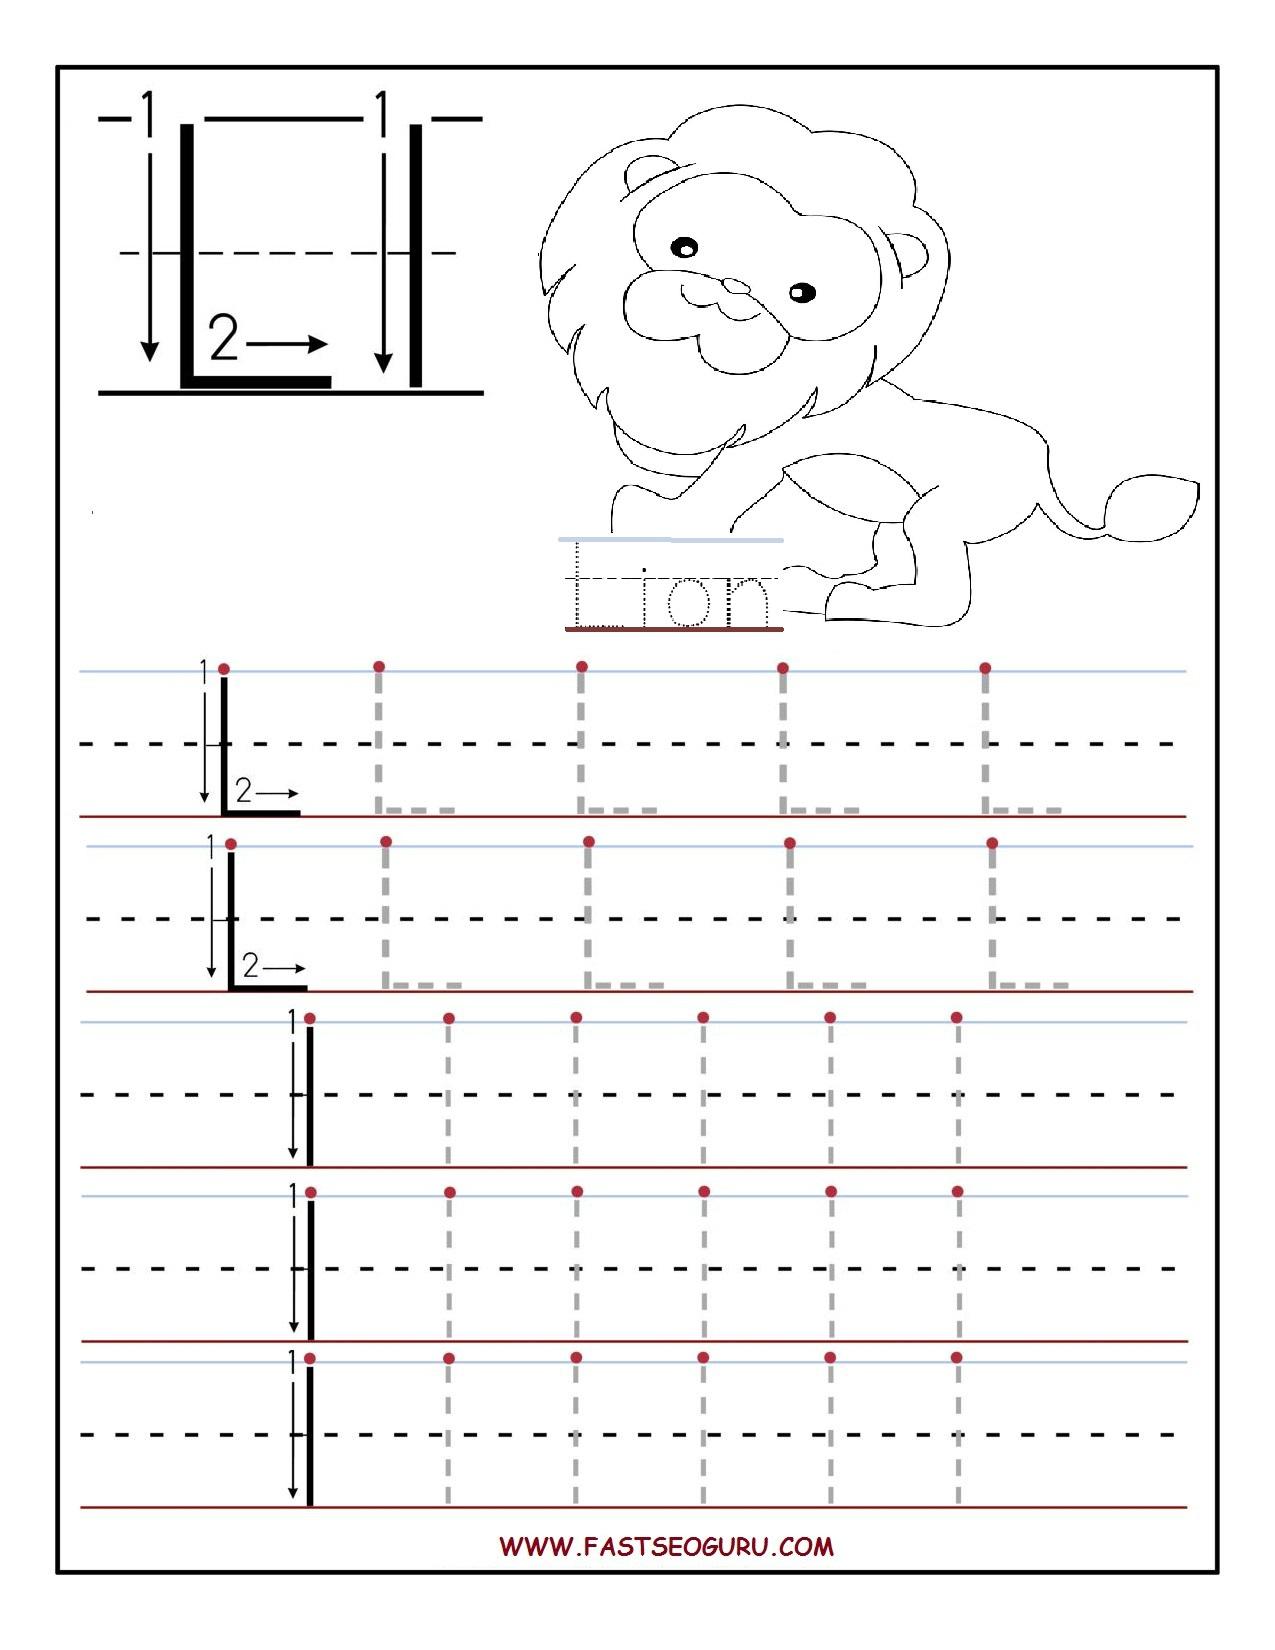 Printable Letter L Tracing Worksheets For Preschool throughout Letter L Worksheets Printable